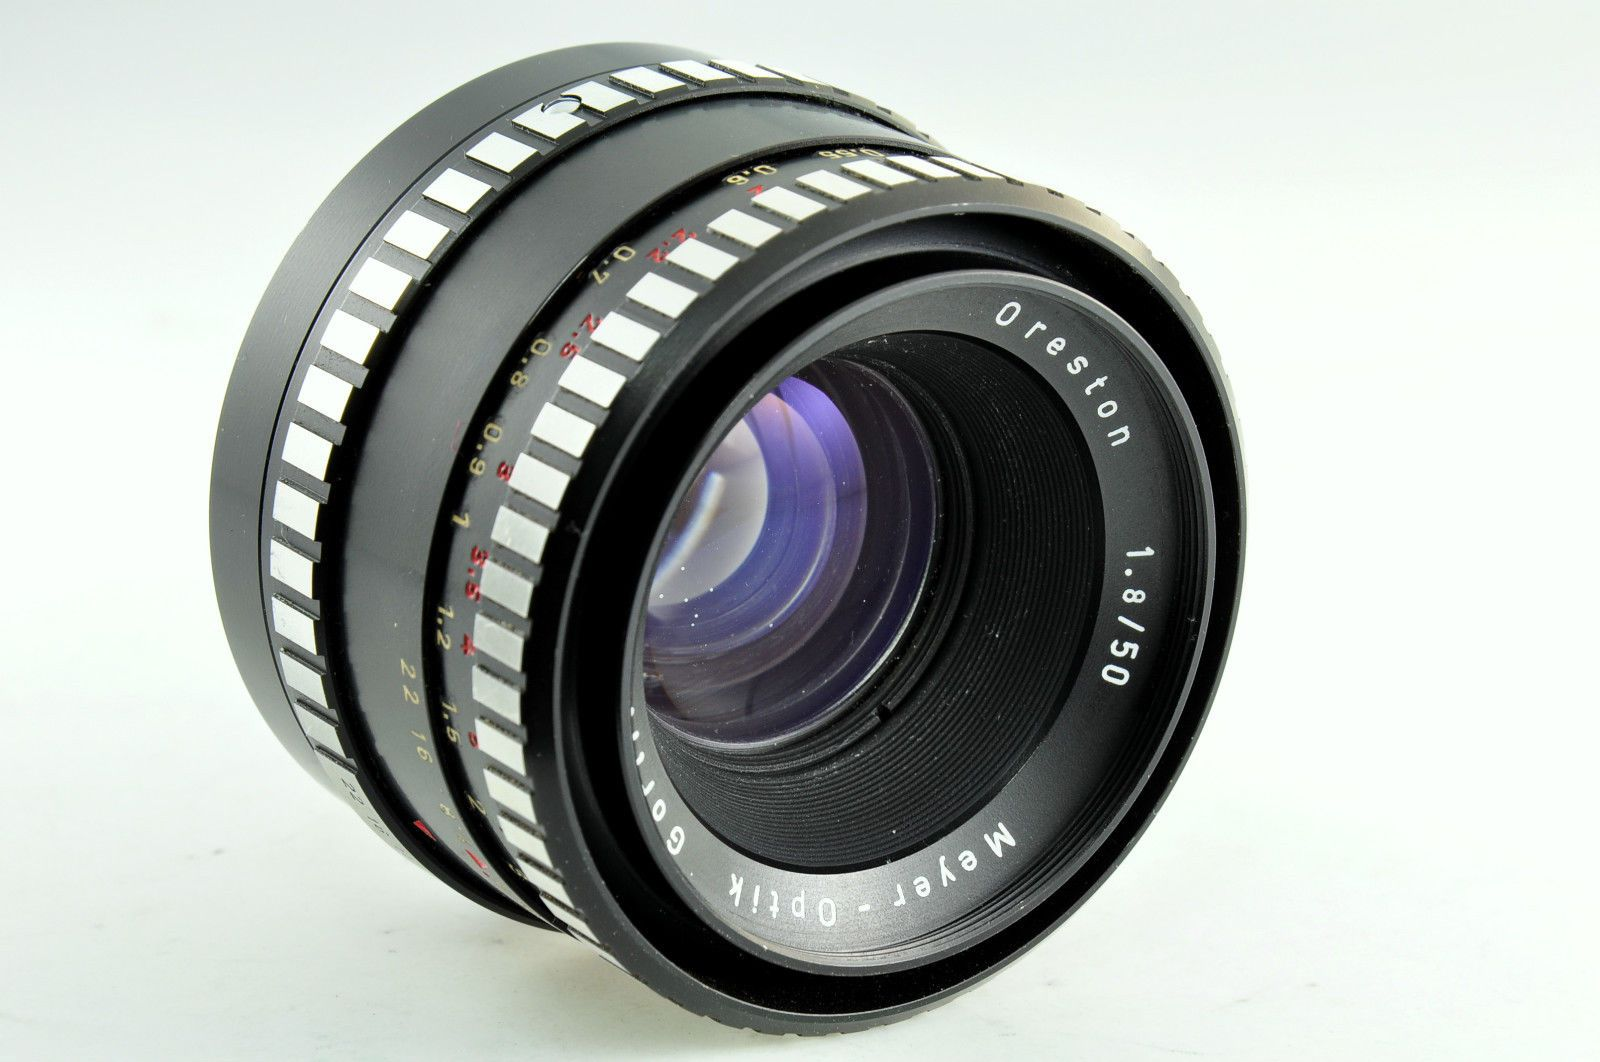 Lens Meyer Optik Görlitz Oreston 1 8 50 M42 Thread | eBay